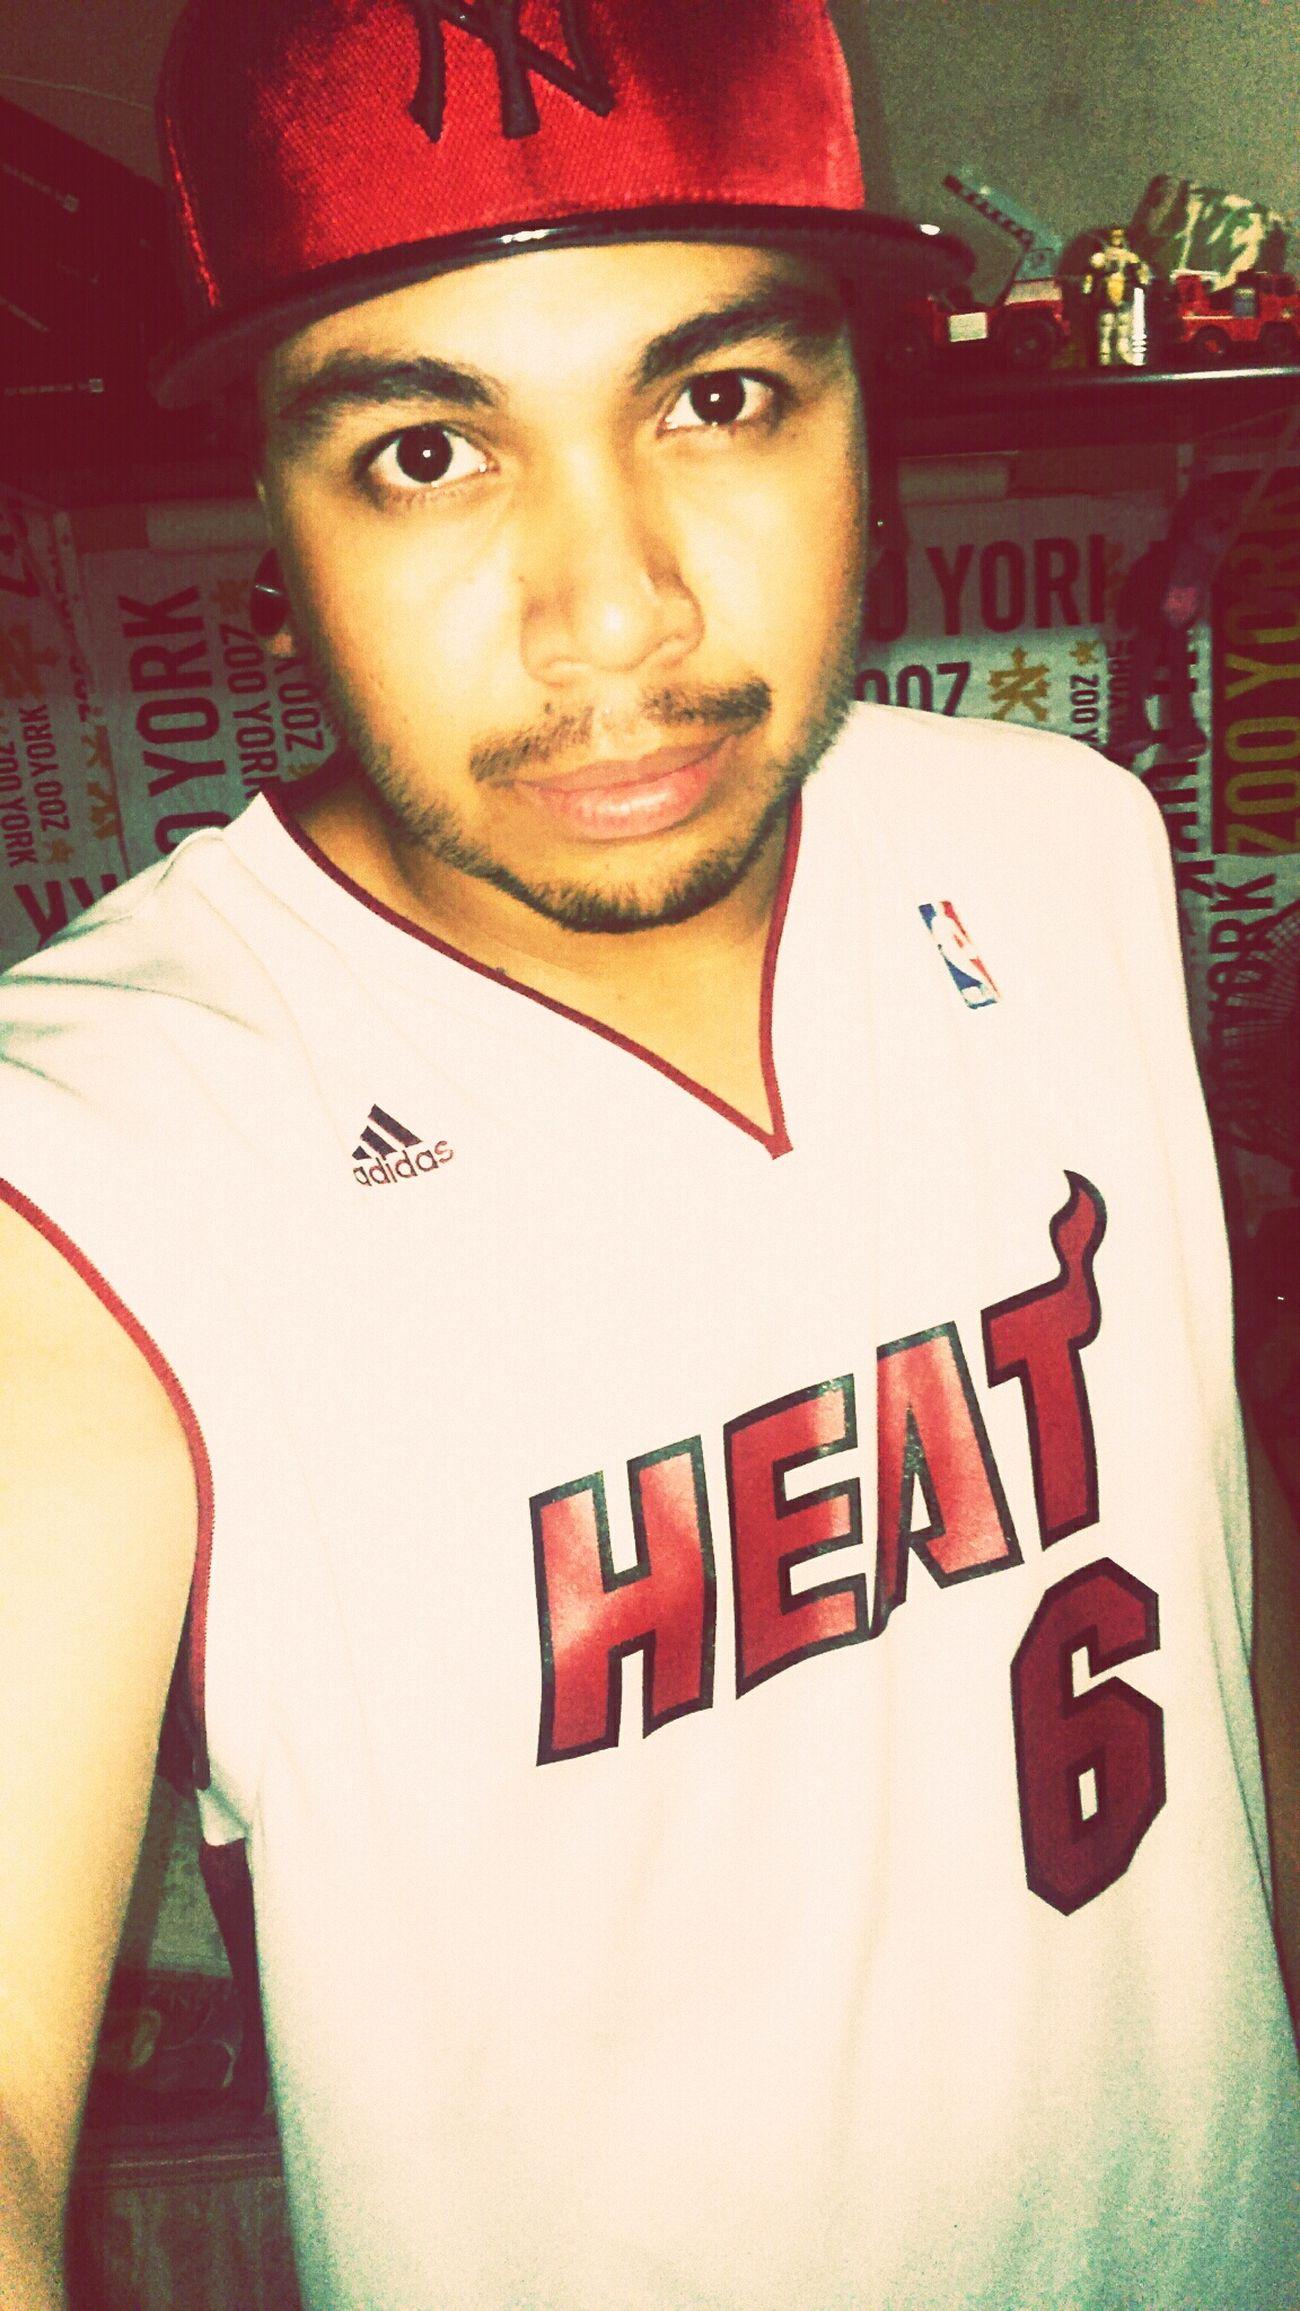 Zooyork Heats NewEra NewEraCaps Style Adidas Basketball NBA